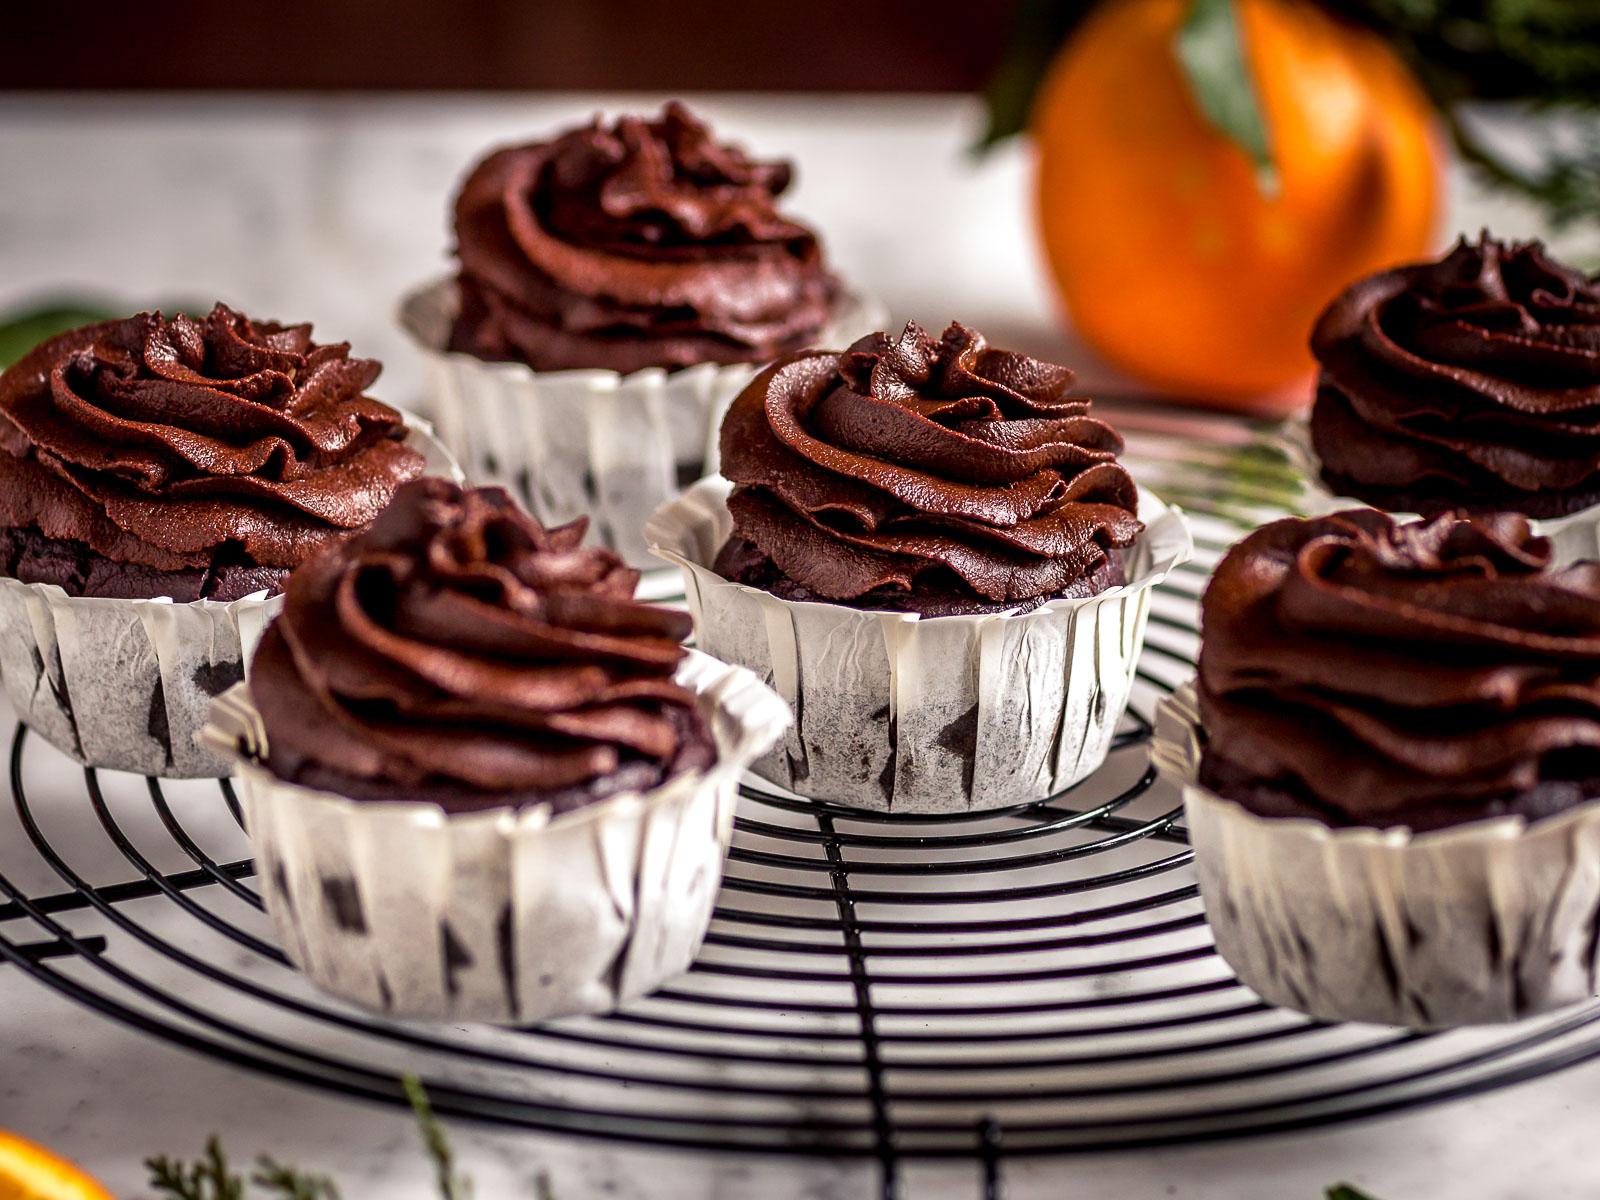 ricetta CUPCAKES VEGAN al CIOCCOLATO ARANCIA e ZUCCA HEALTHY vegan chocolate pumpkin cupcakes with date chocolate frosting senza zucchero